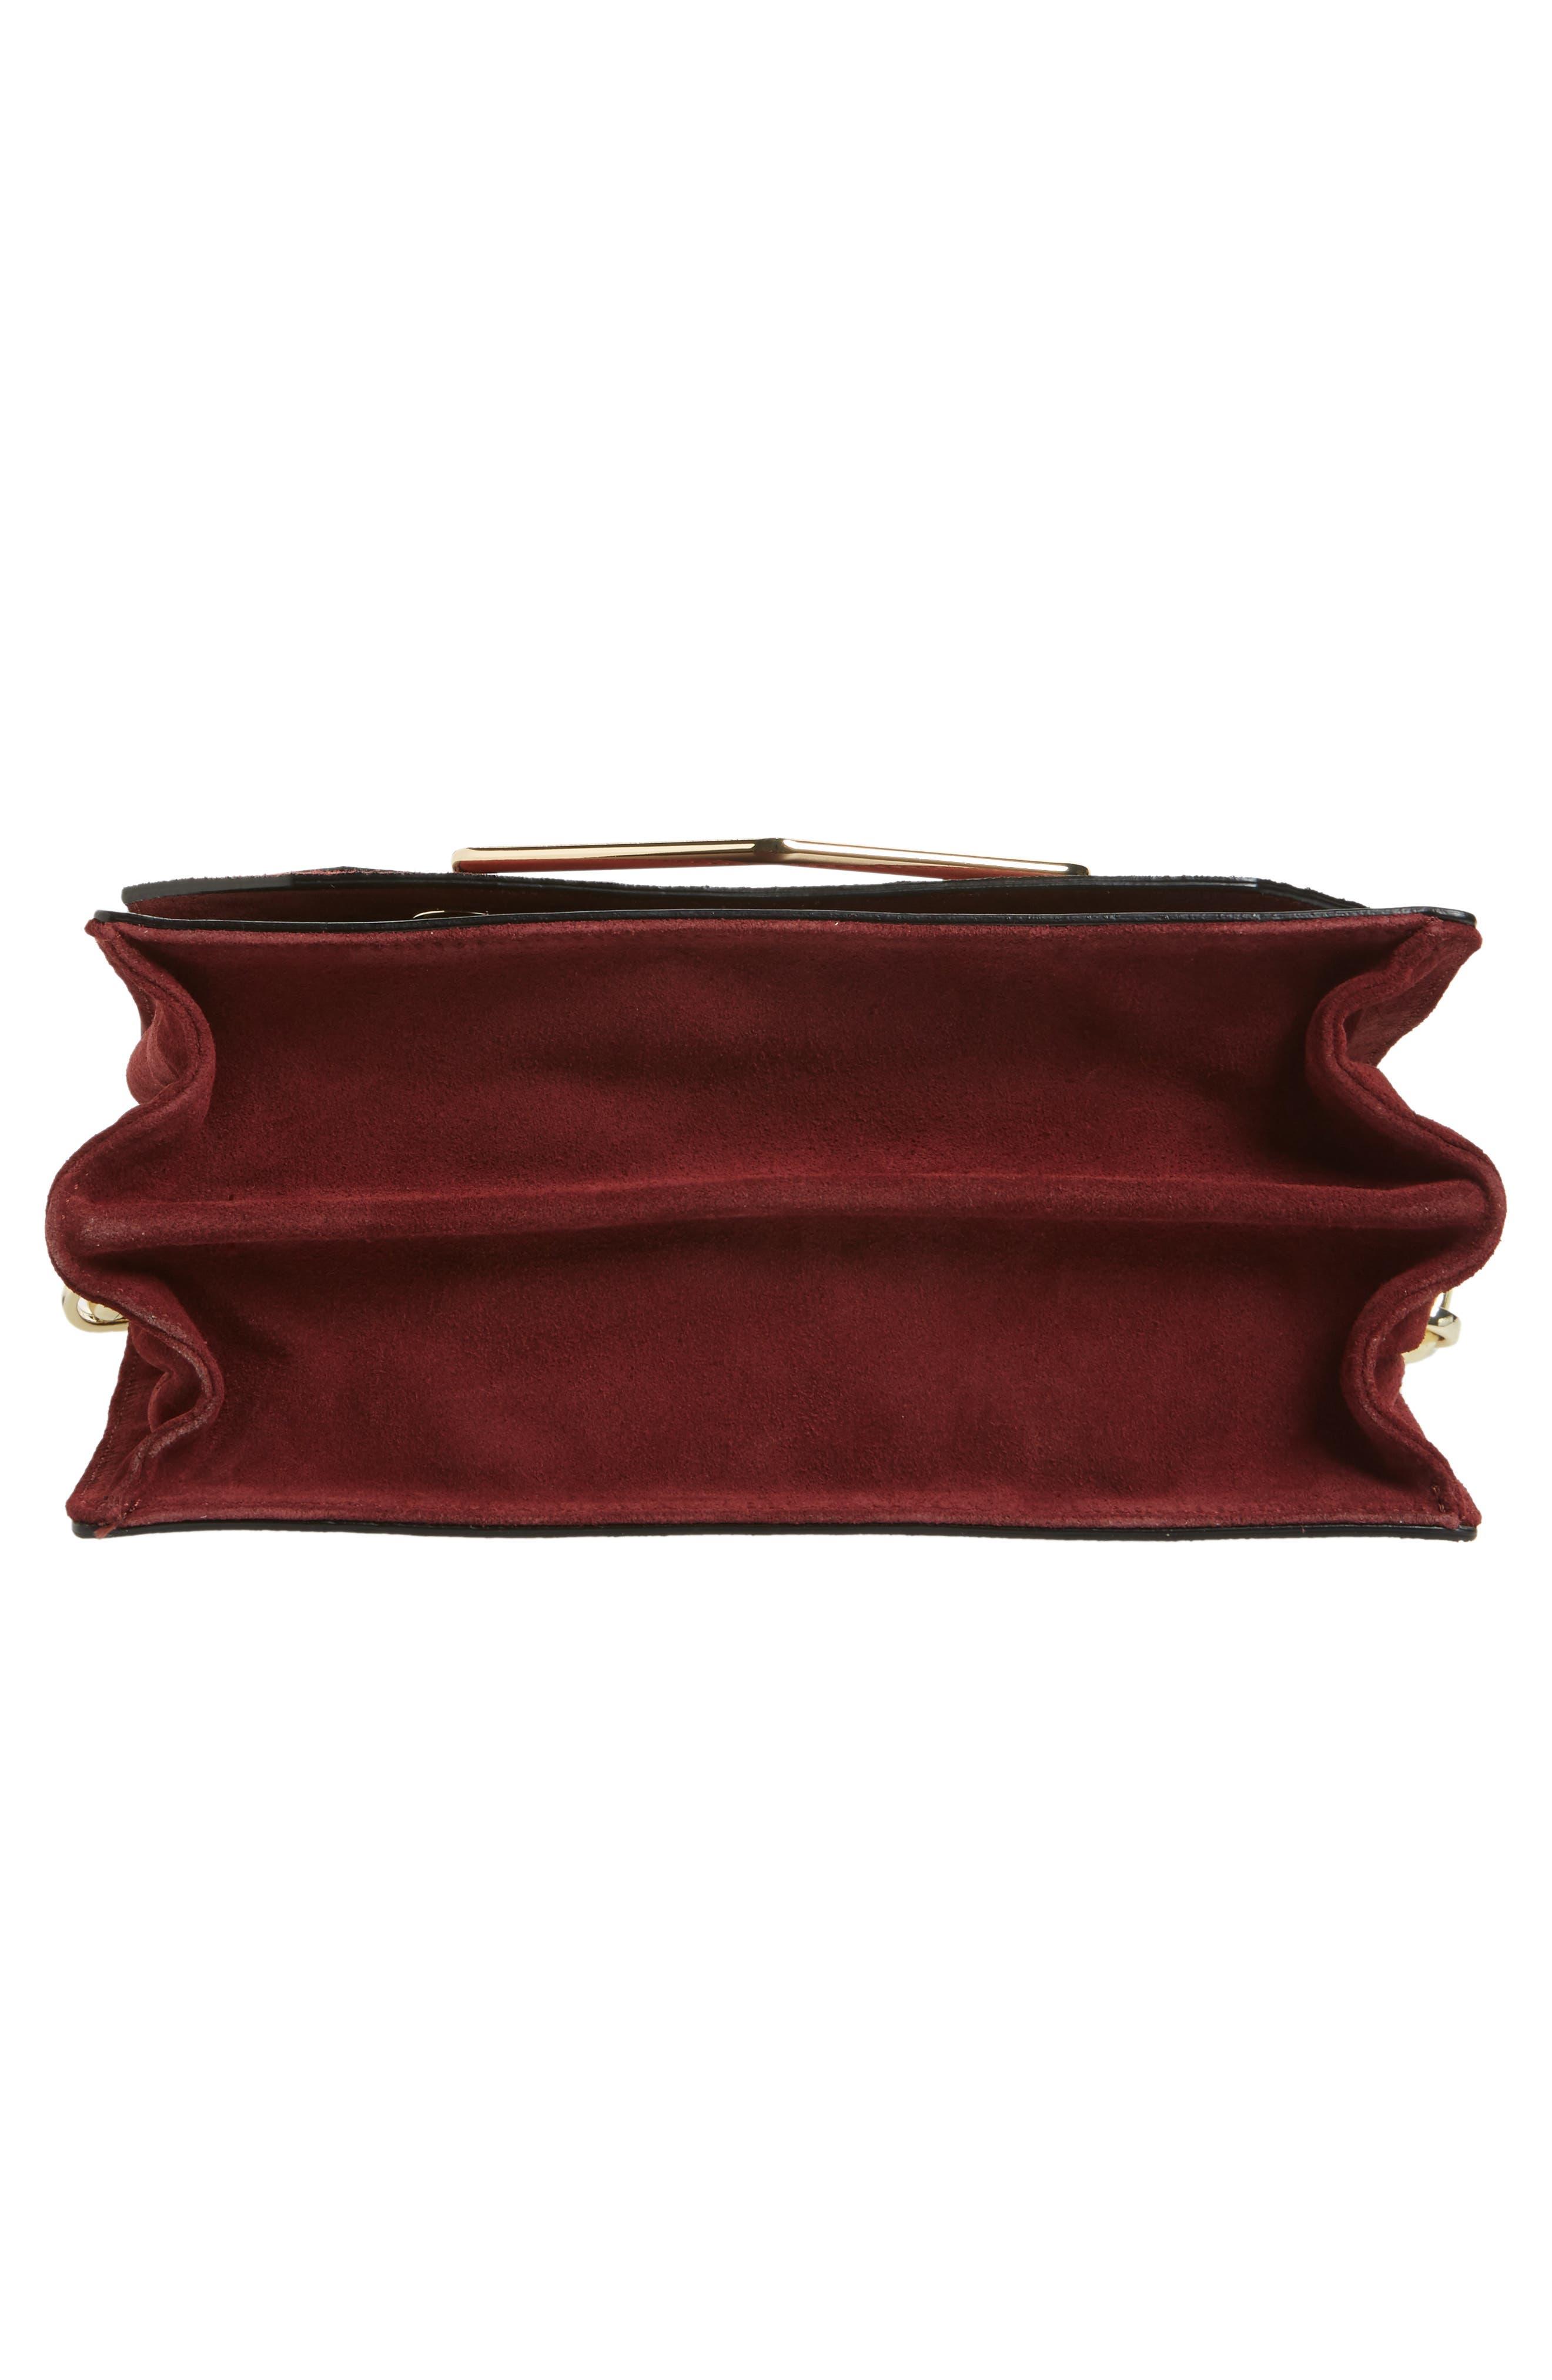 Premium Leather & Suede Soko Shoulder Bag,                             Alternate thumbnail 6, color,                             930